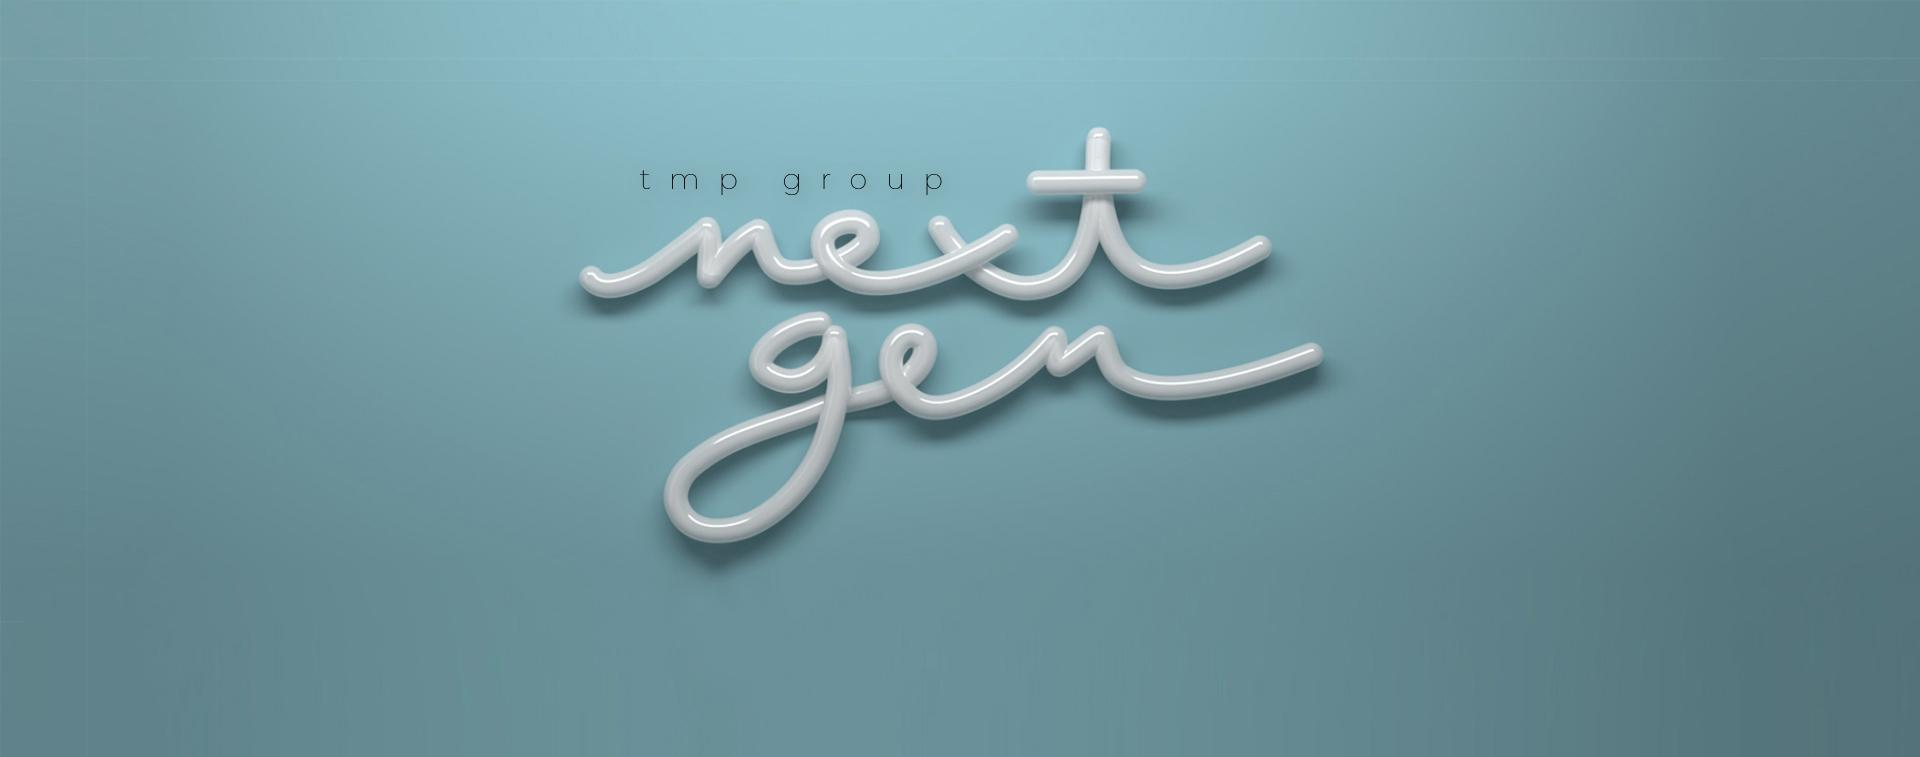 Next Gen-img-principale